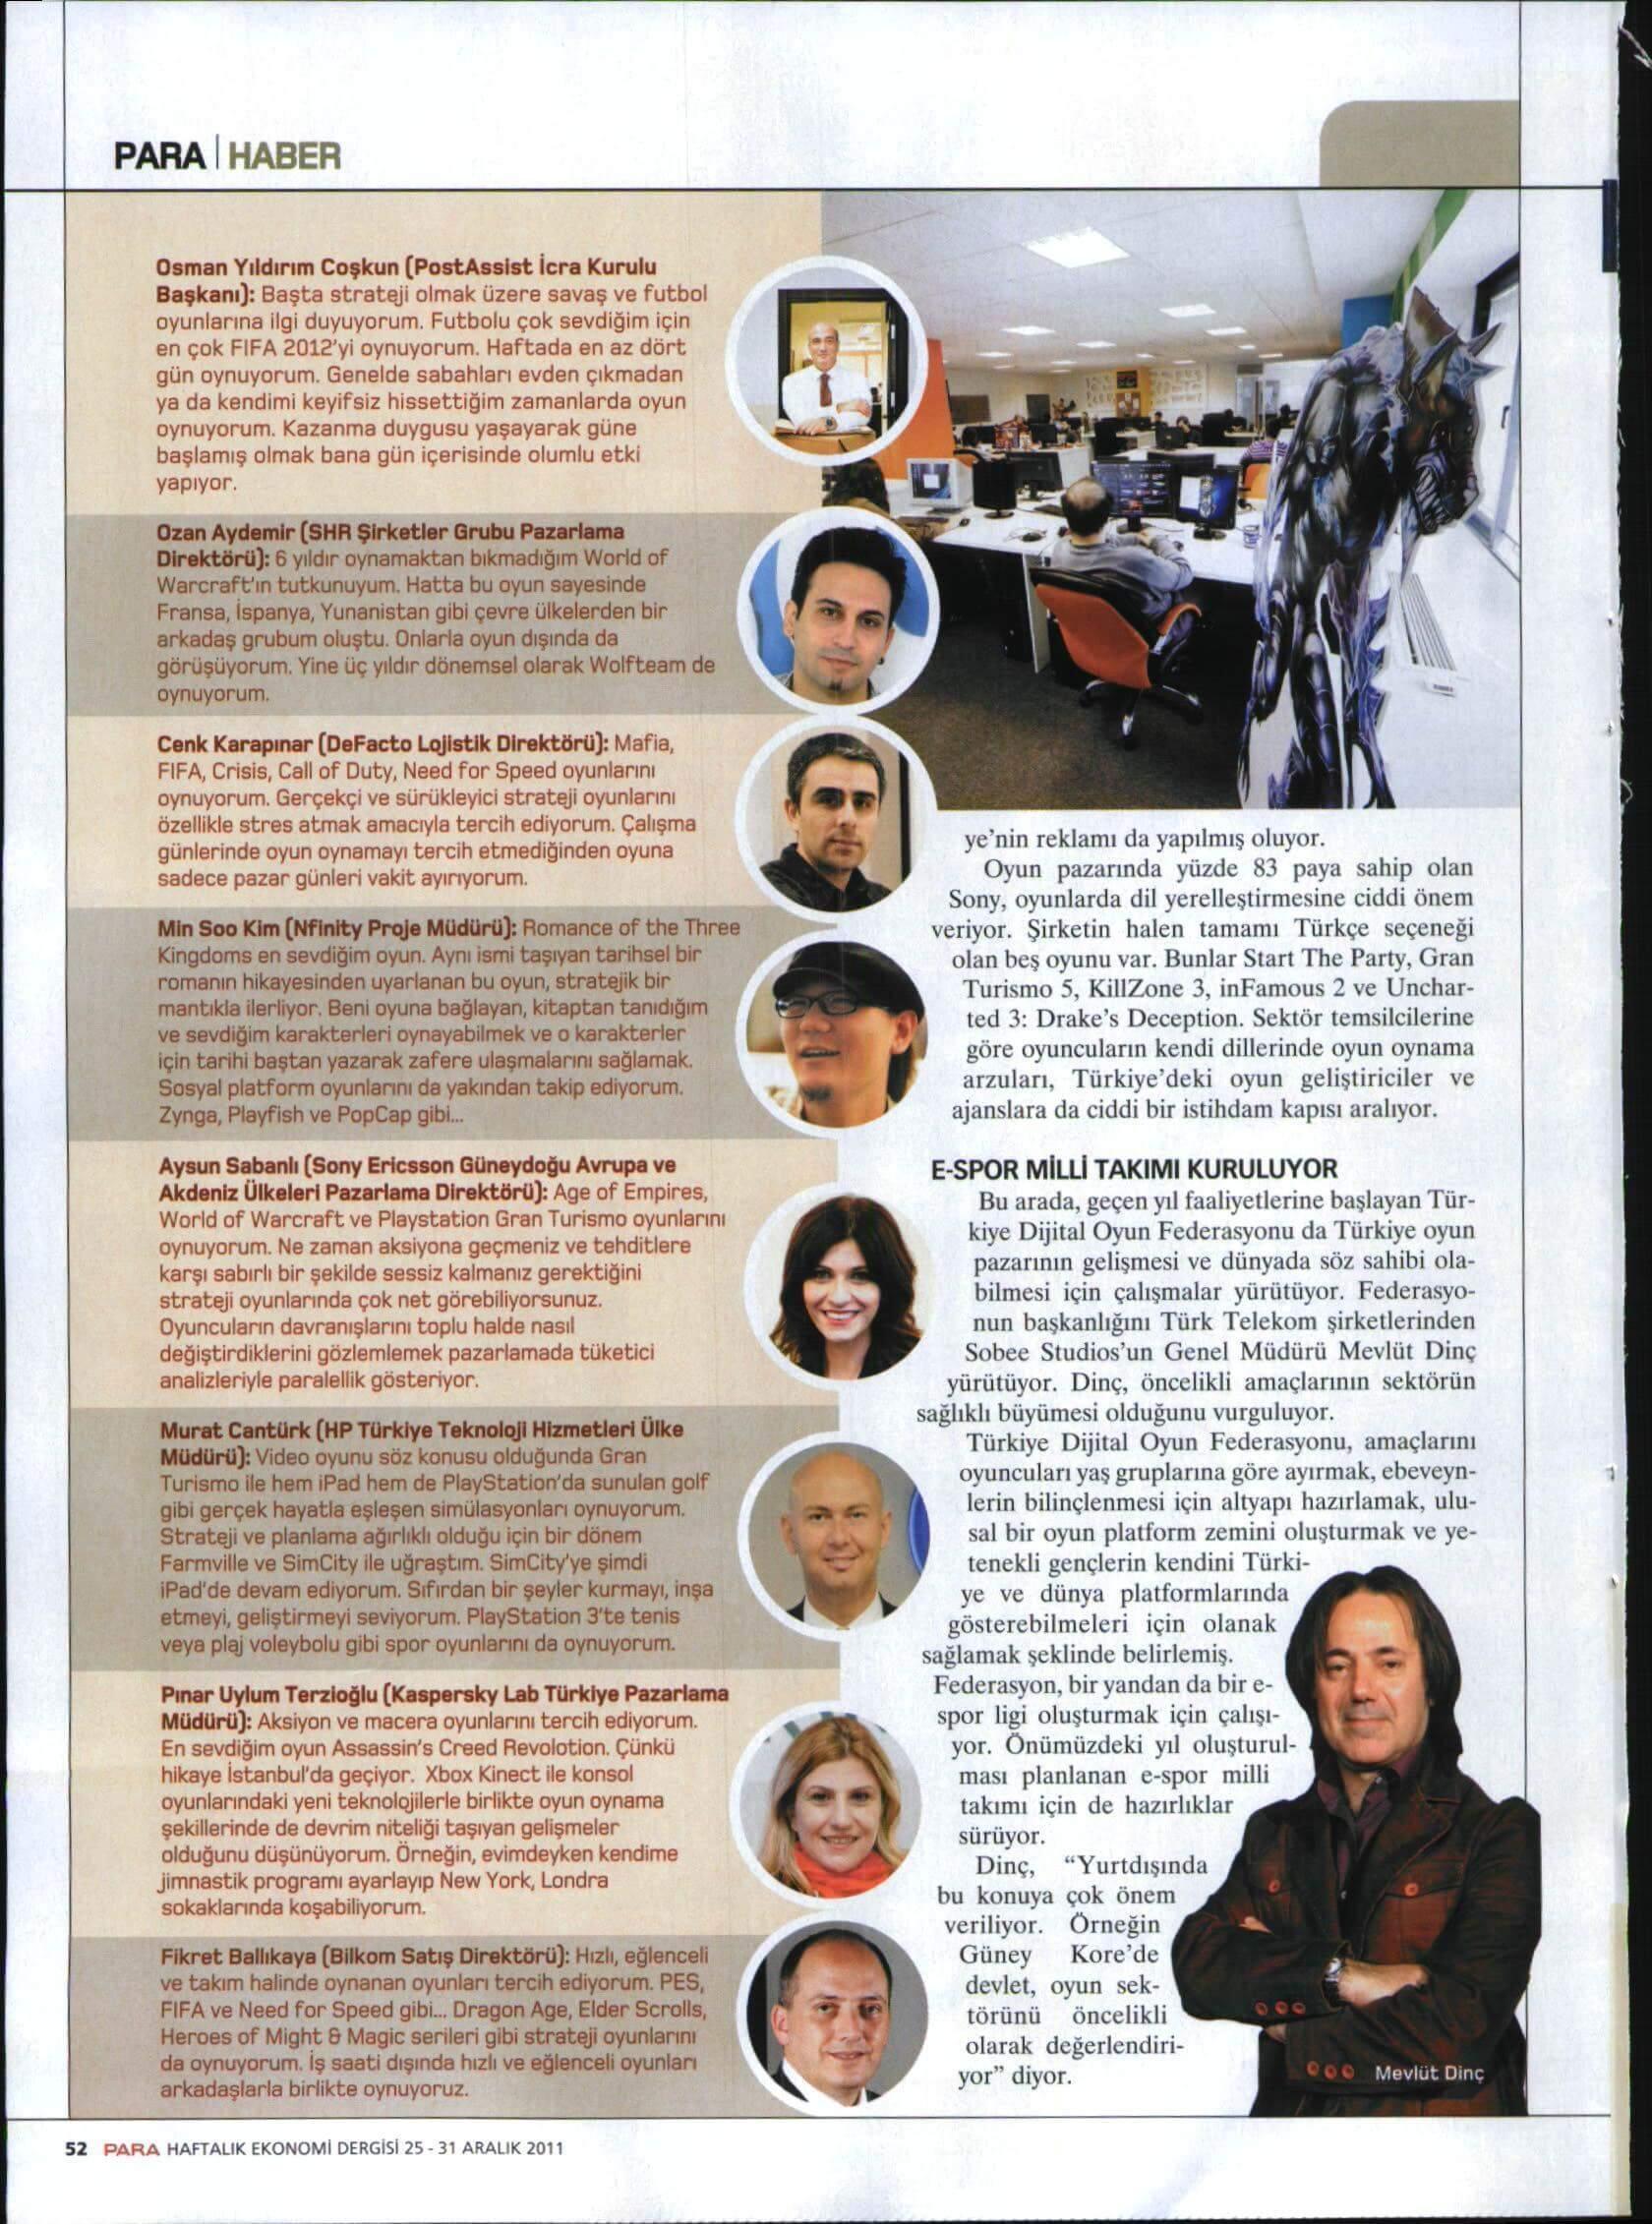 joygame basin yansimalari para dergi 25 aralik haberi